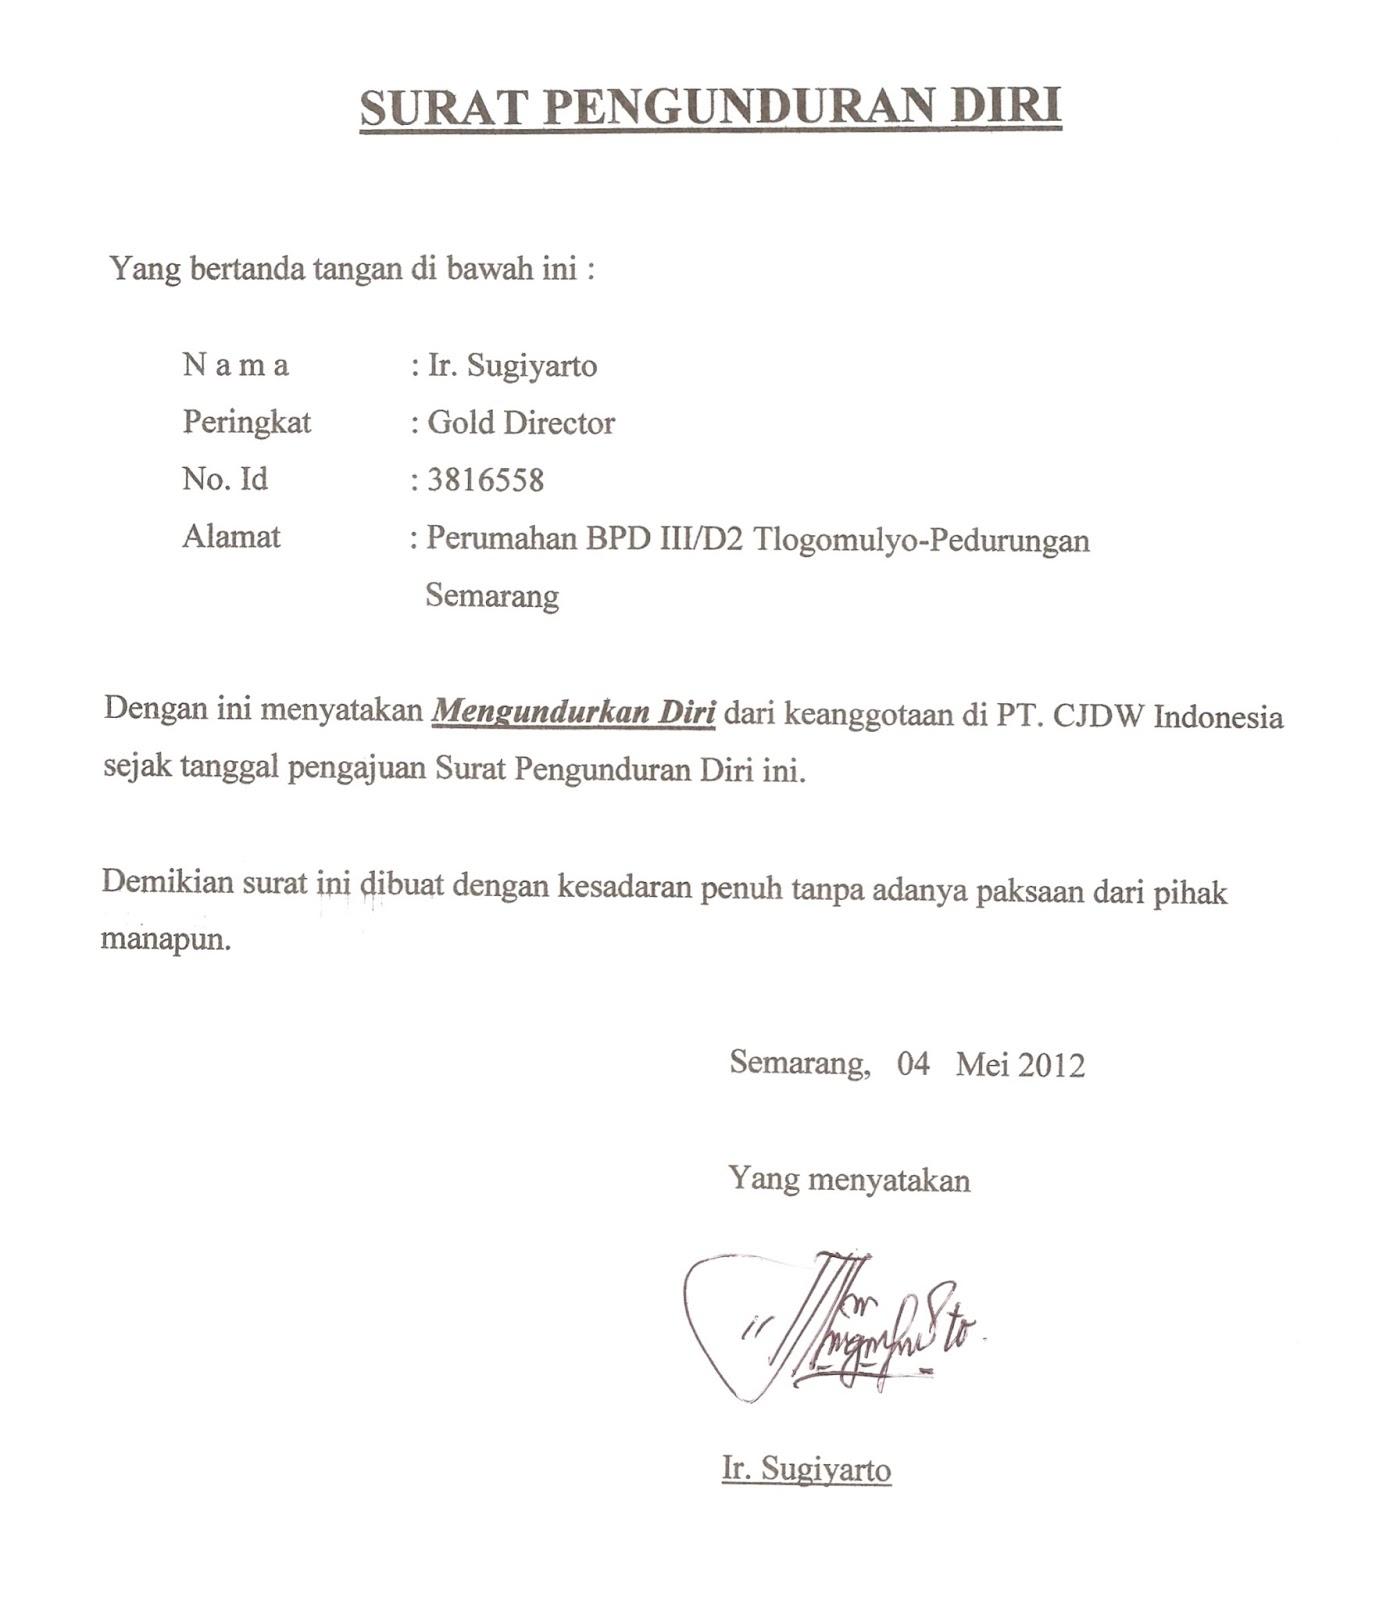 Contoh Surat Pengunduran Diri Direktur Cv Contoh Random